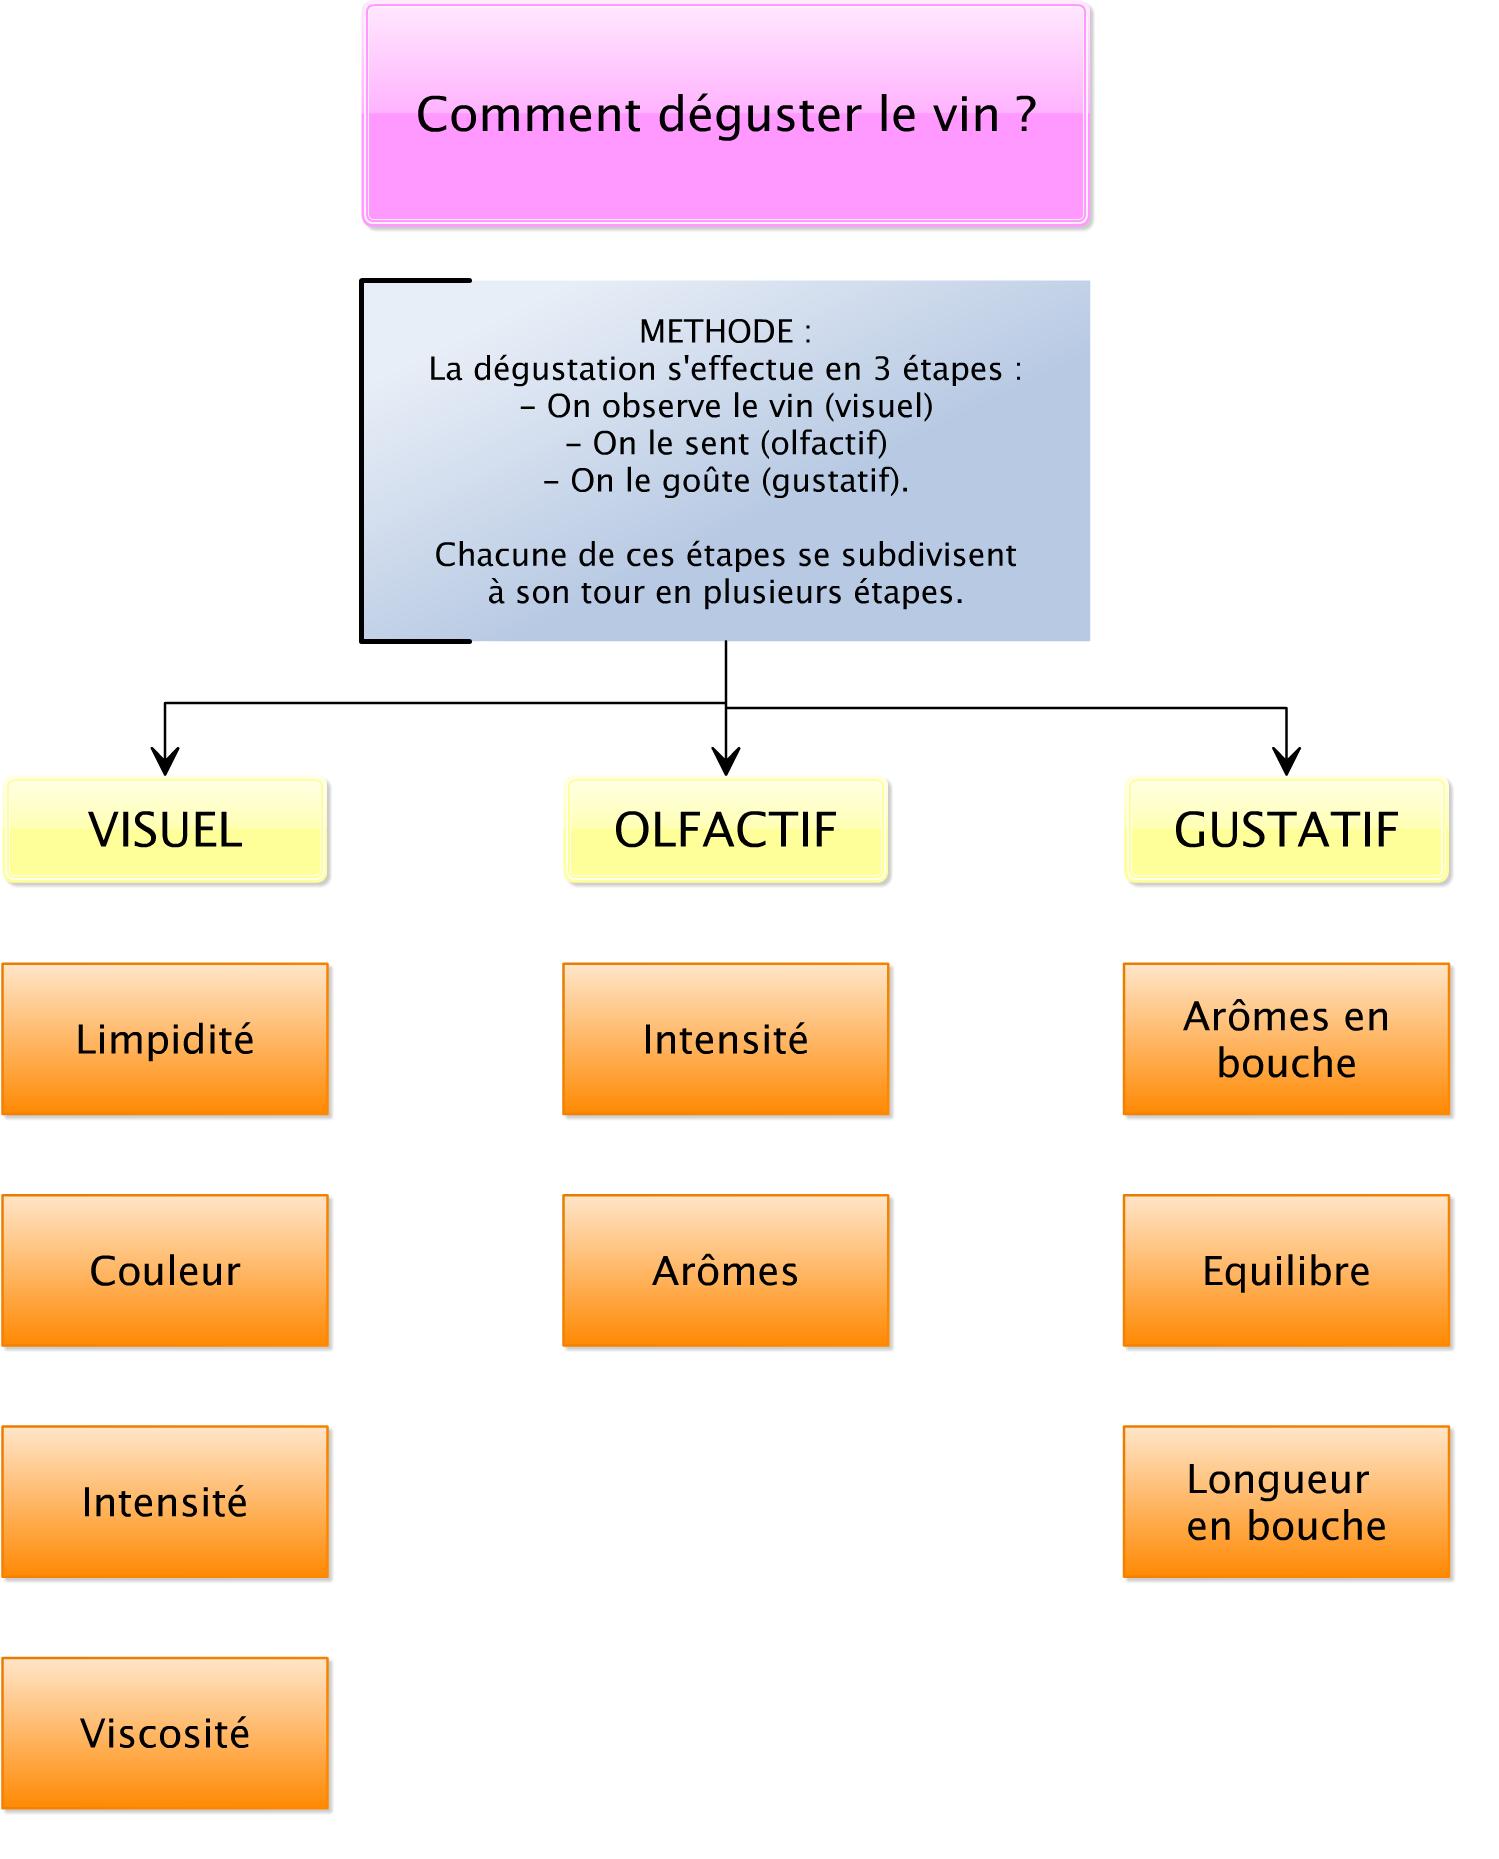 Bien-aimé elaboration champagne schema - Recherche Google | Vinos ,Vins  JH35